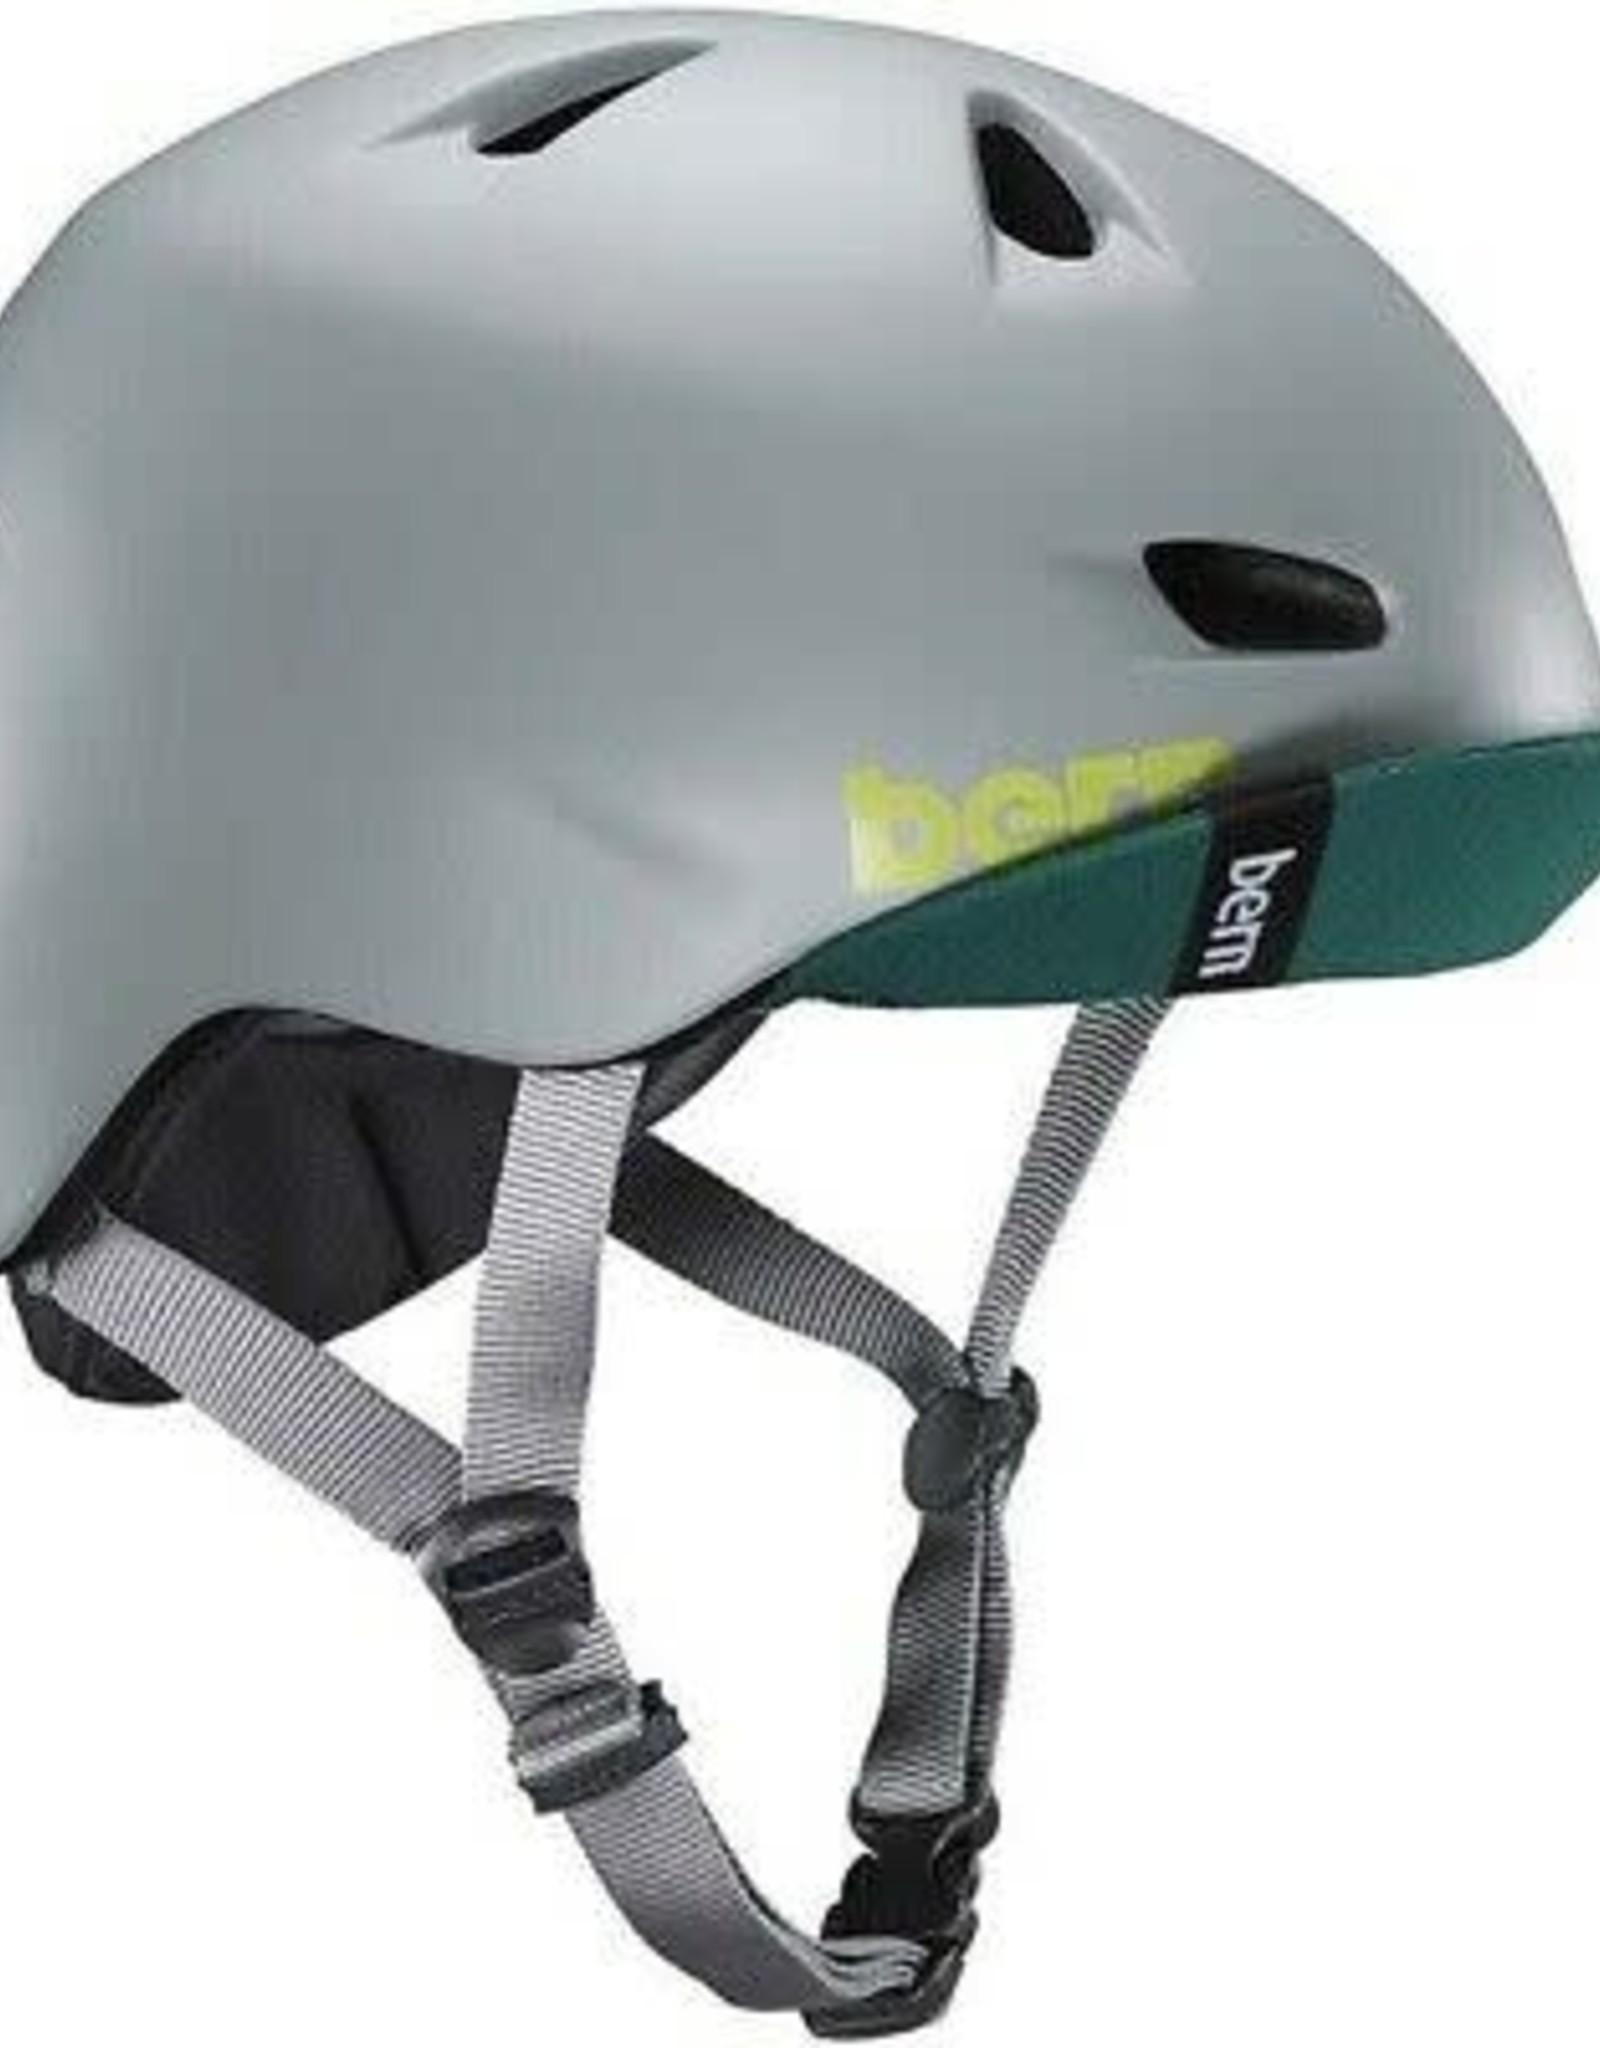 BERN Bern, Brentwood, Helmet, Pavement, S, 52-55.5cm